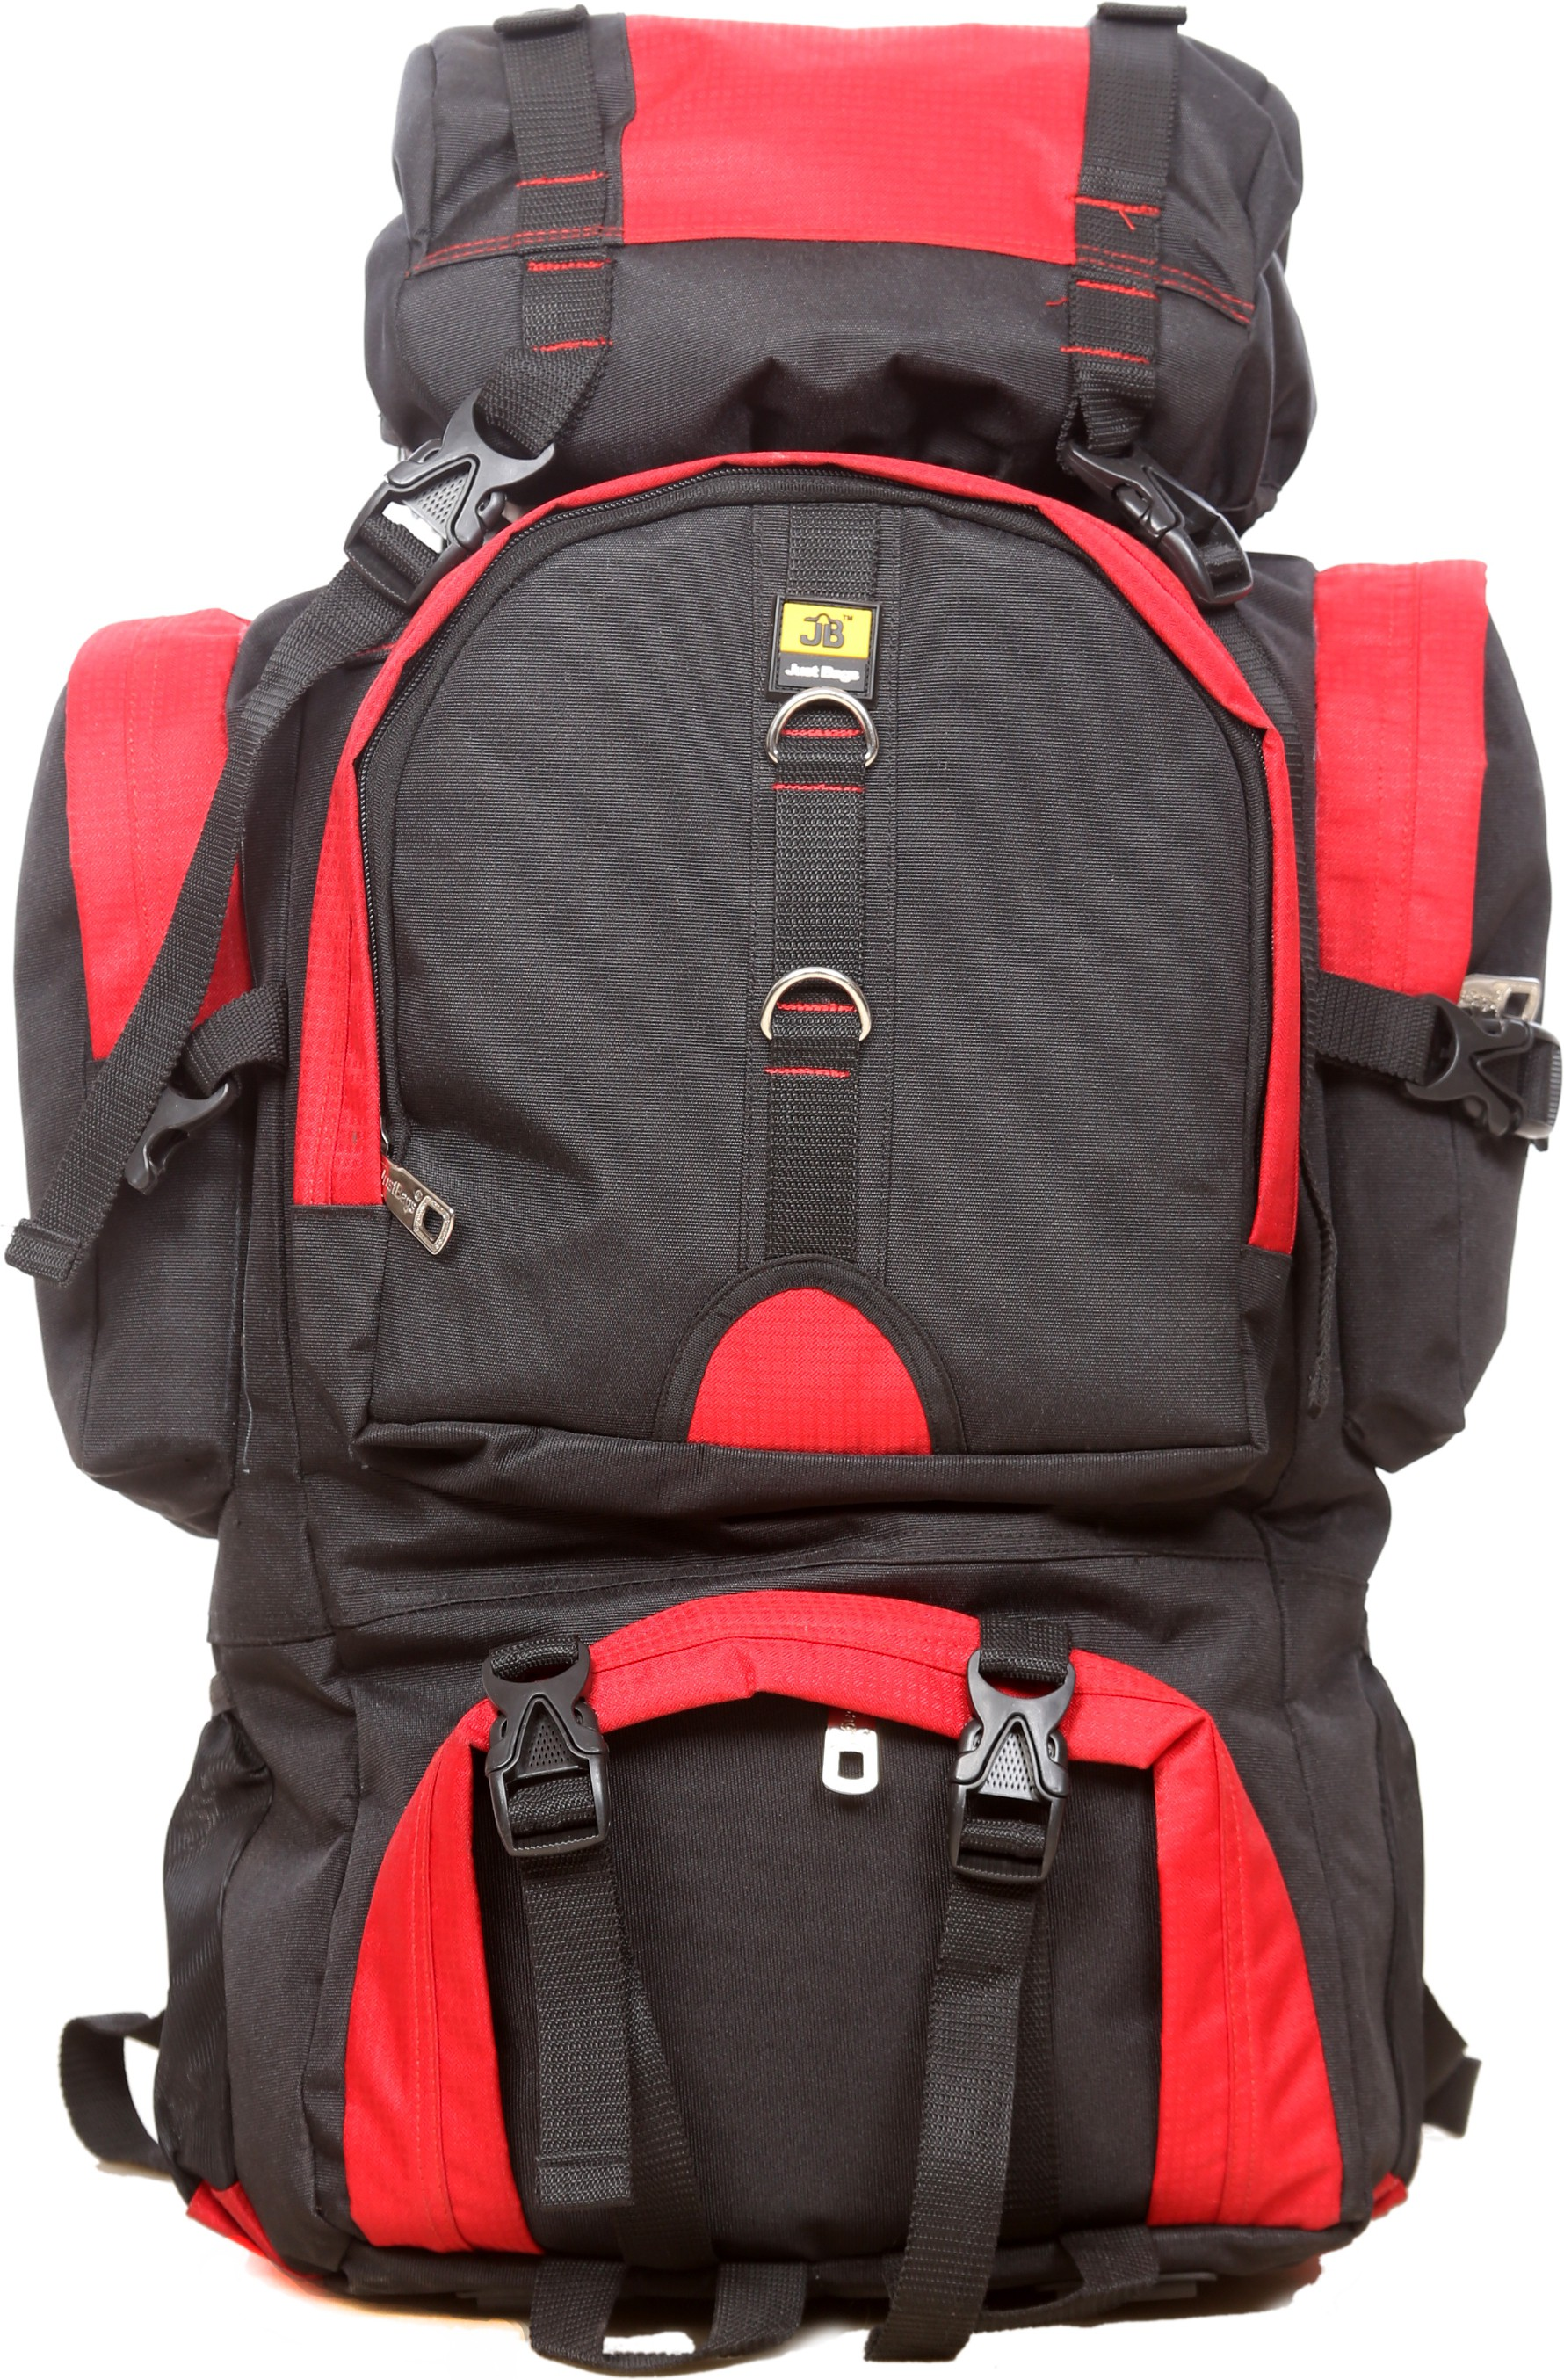 Compare Just Bags Fuji Rucksack  - 55 L at Compare Hatke